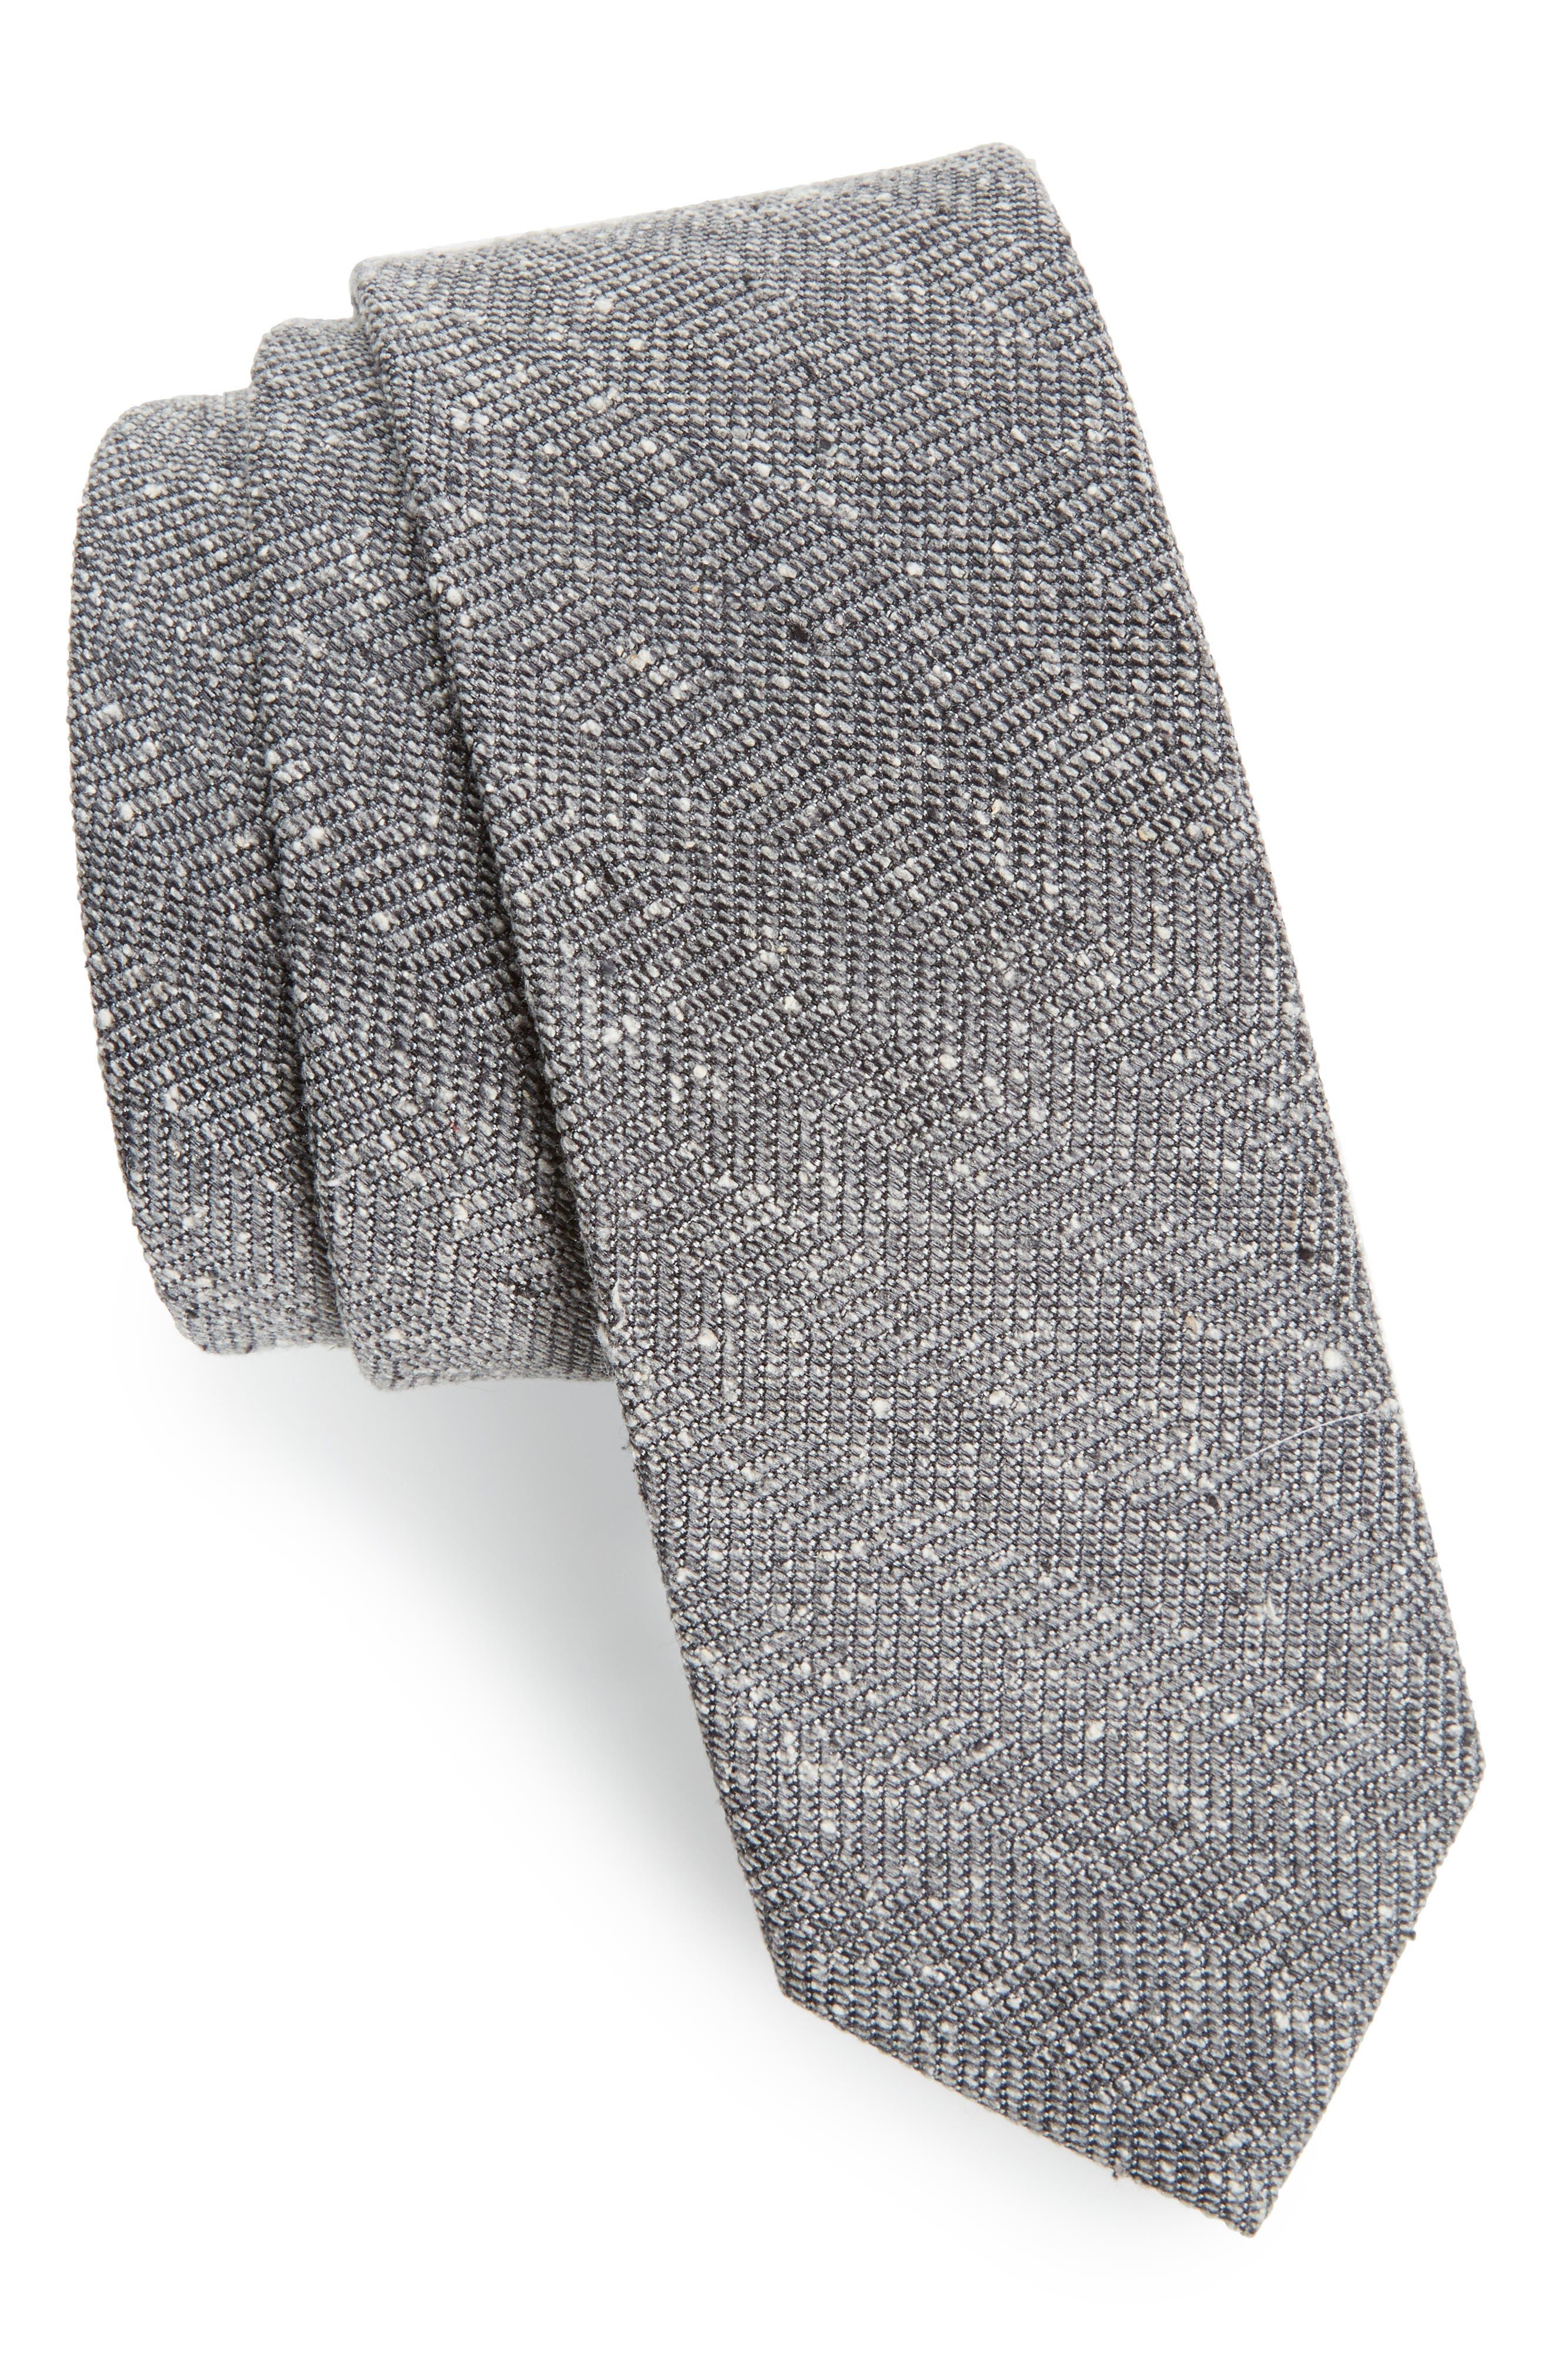 Zigzag Silk Tie,                             Main thumbnail 1, color,                             030